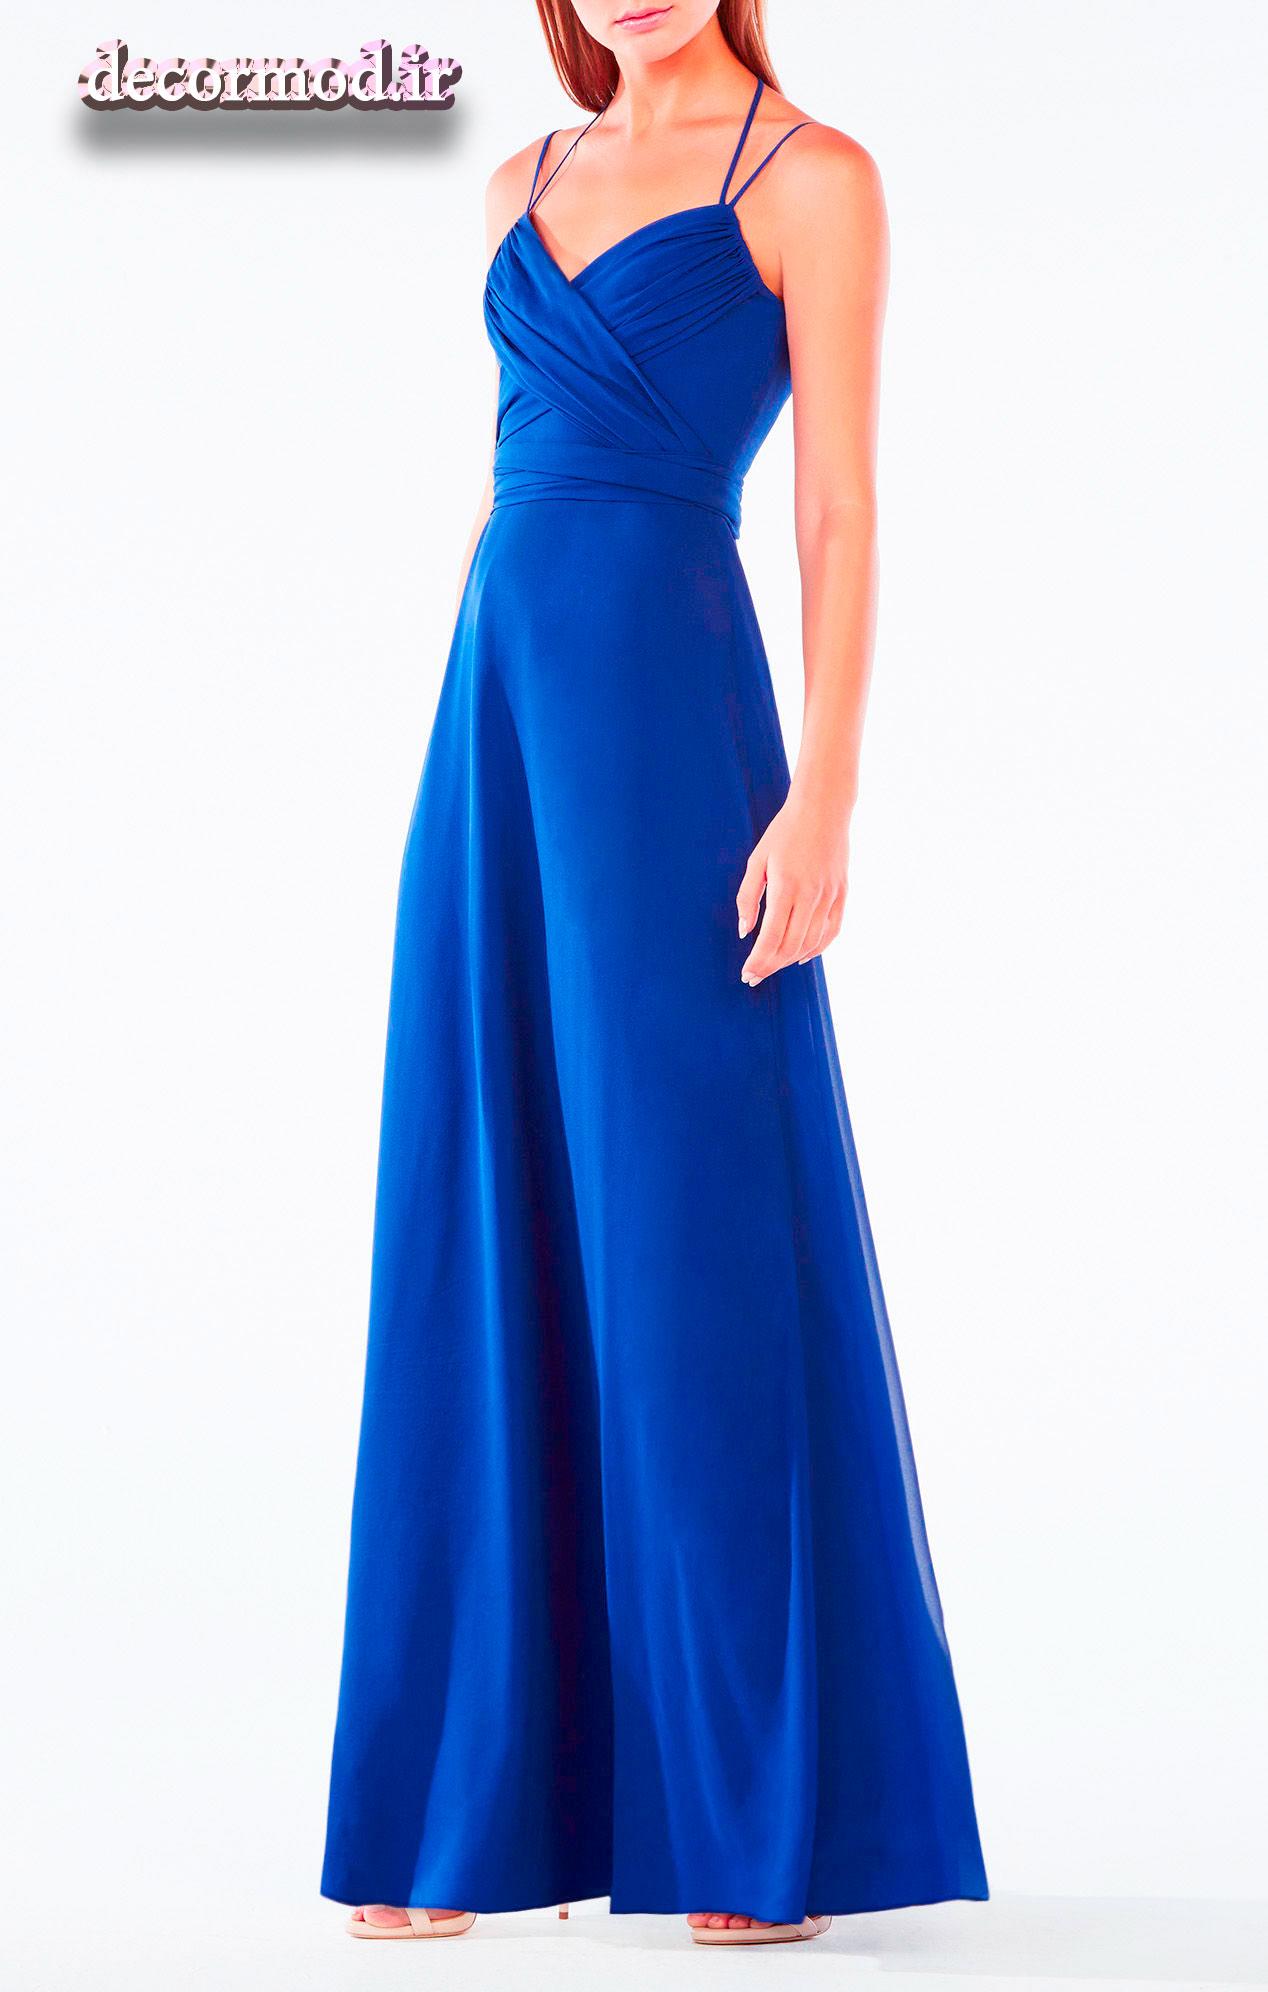 لباس شب 33